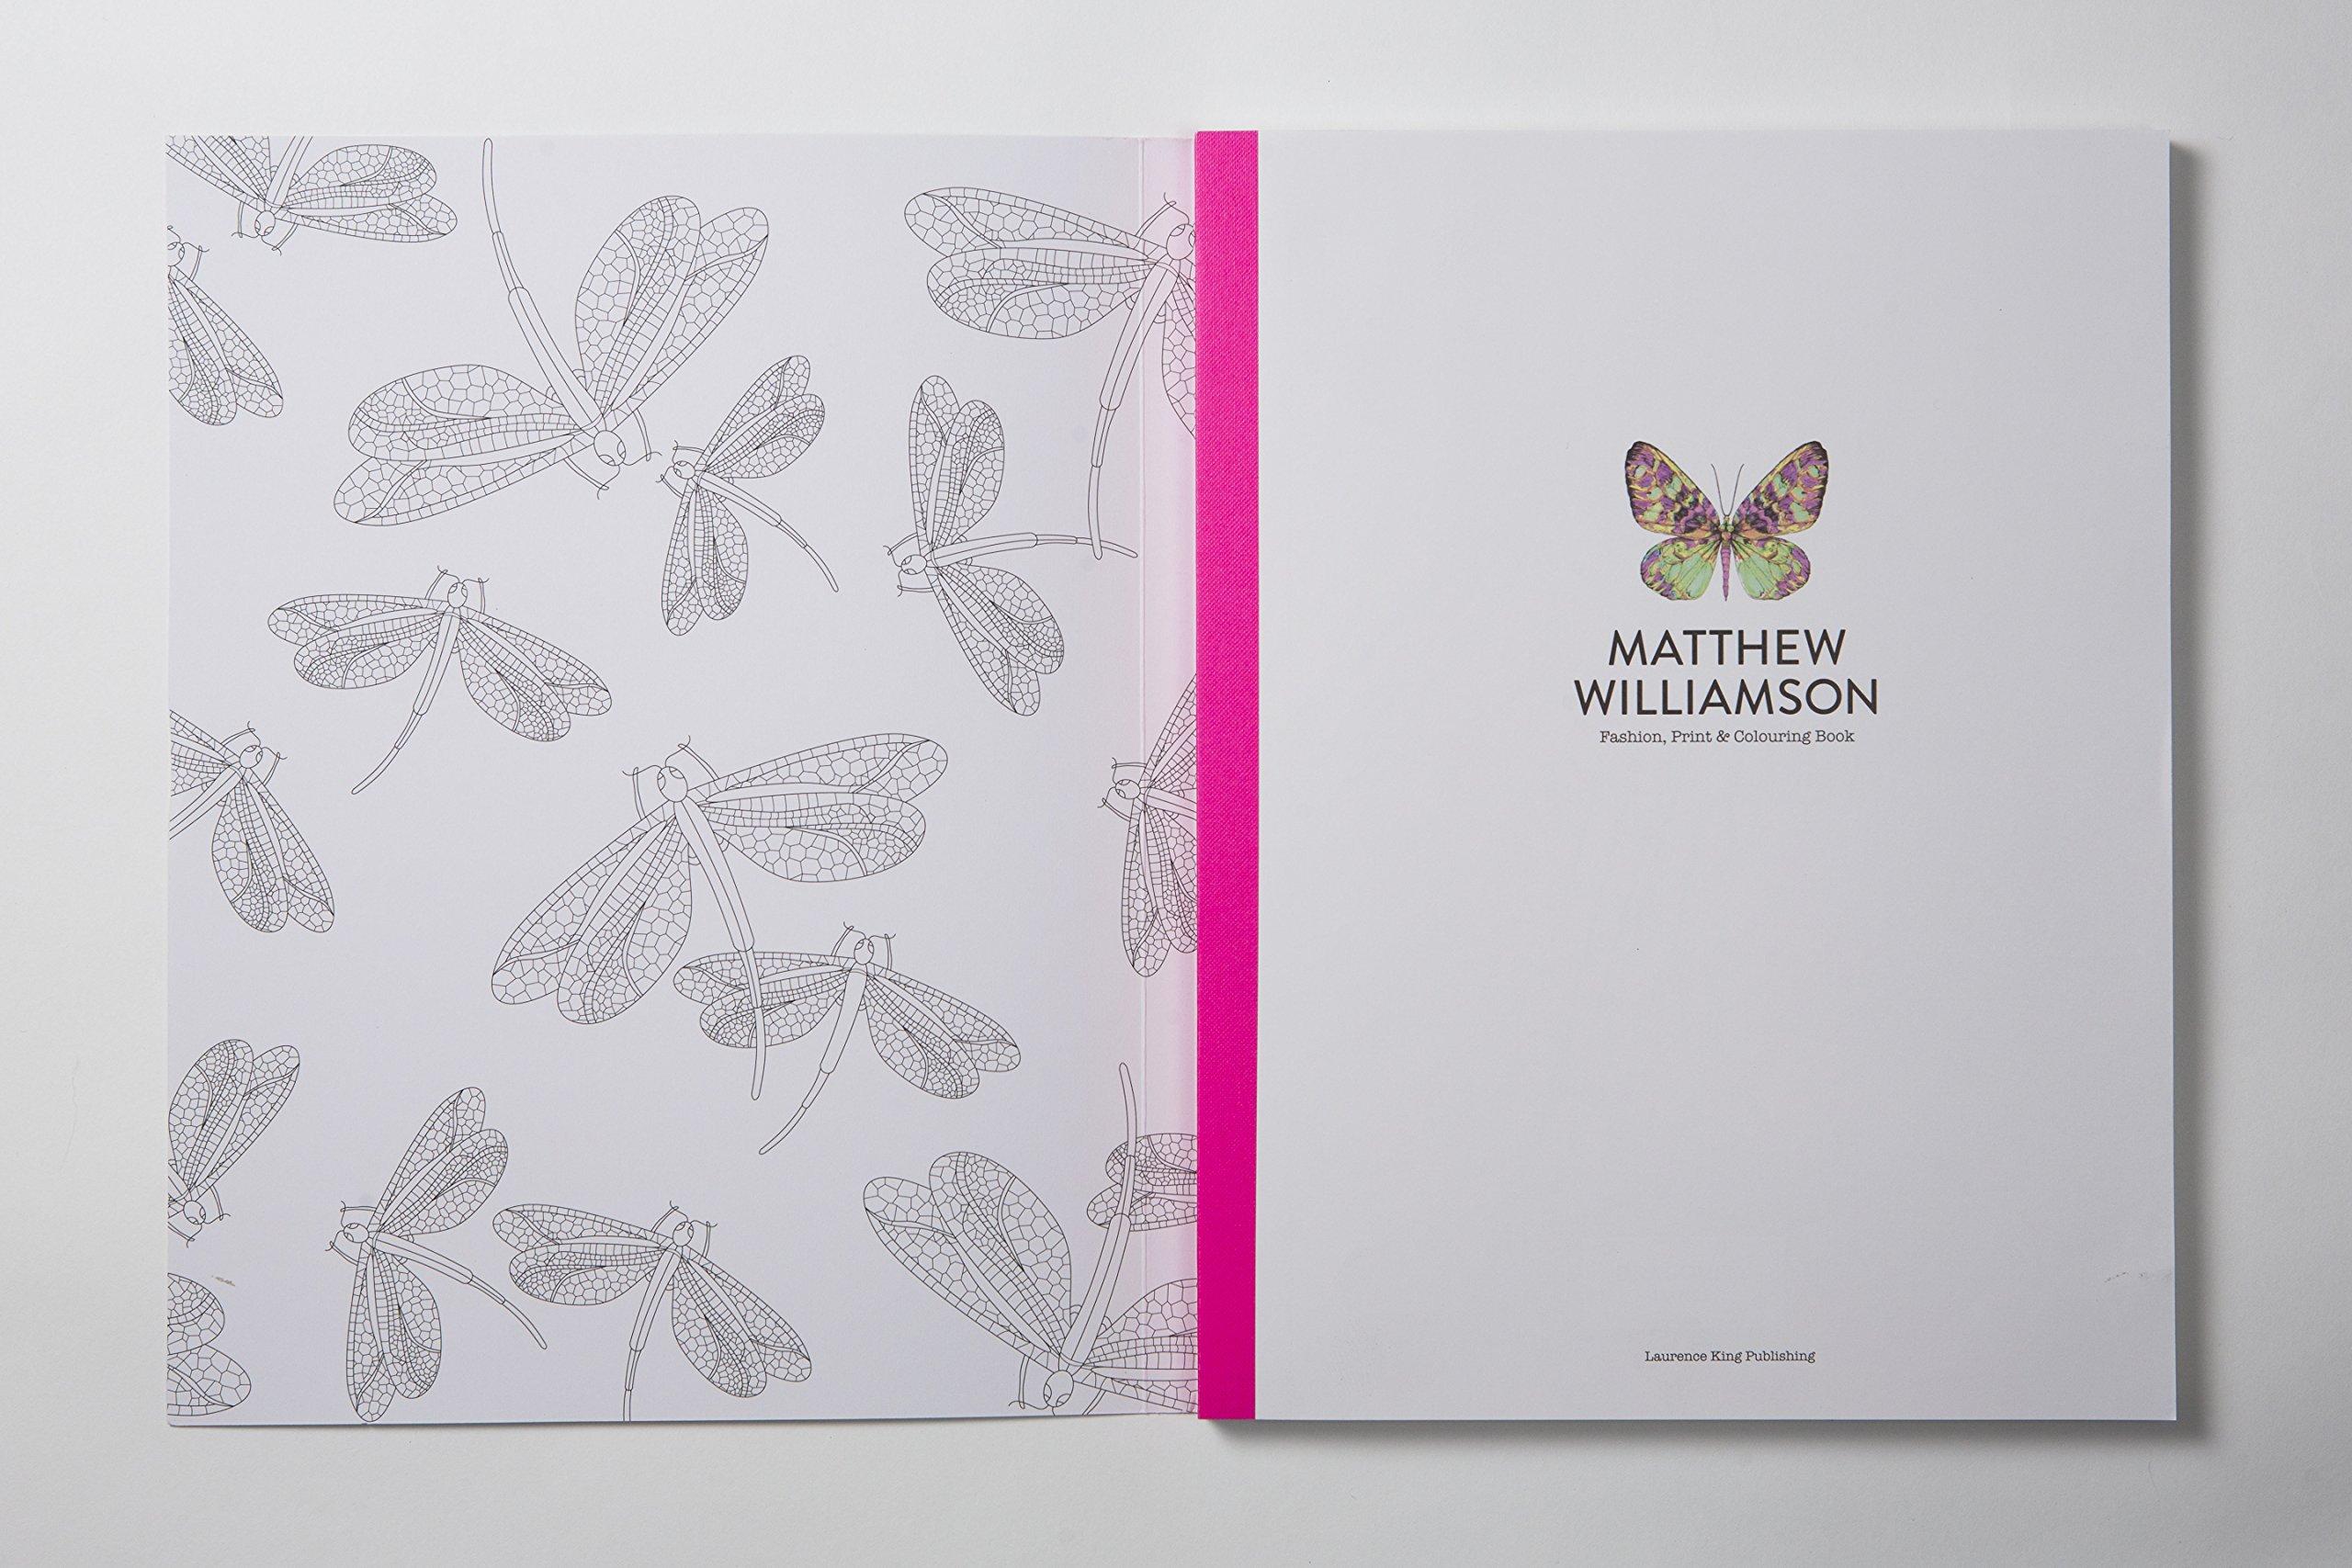 Amazon Matthew Williamson Fashion Print And Colouring 9781780678979 Books